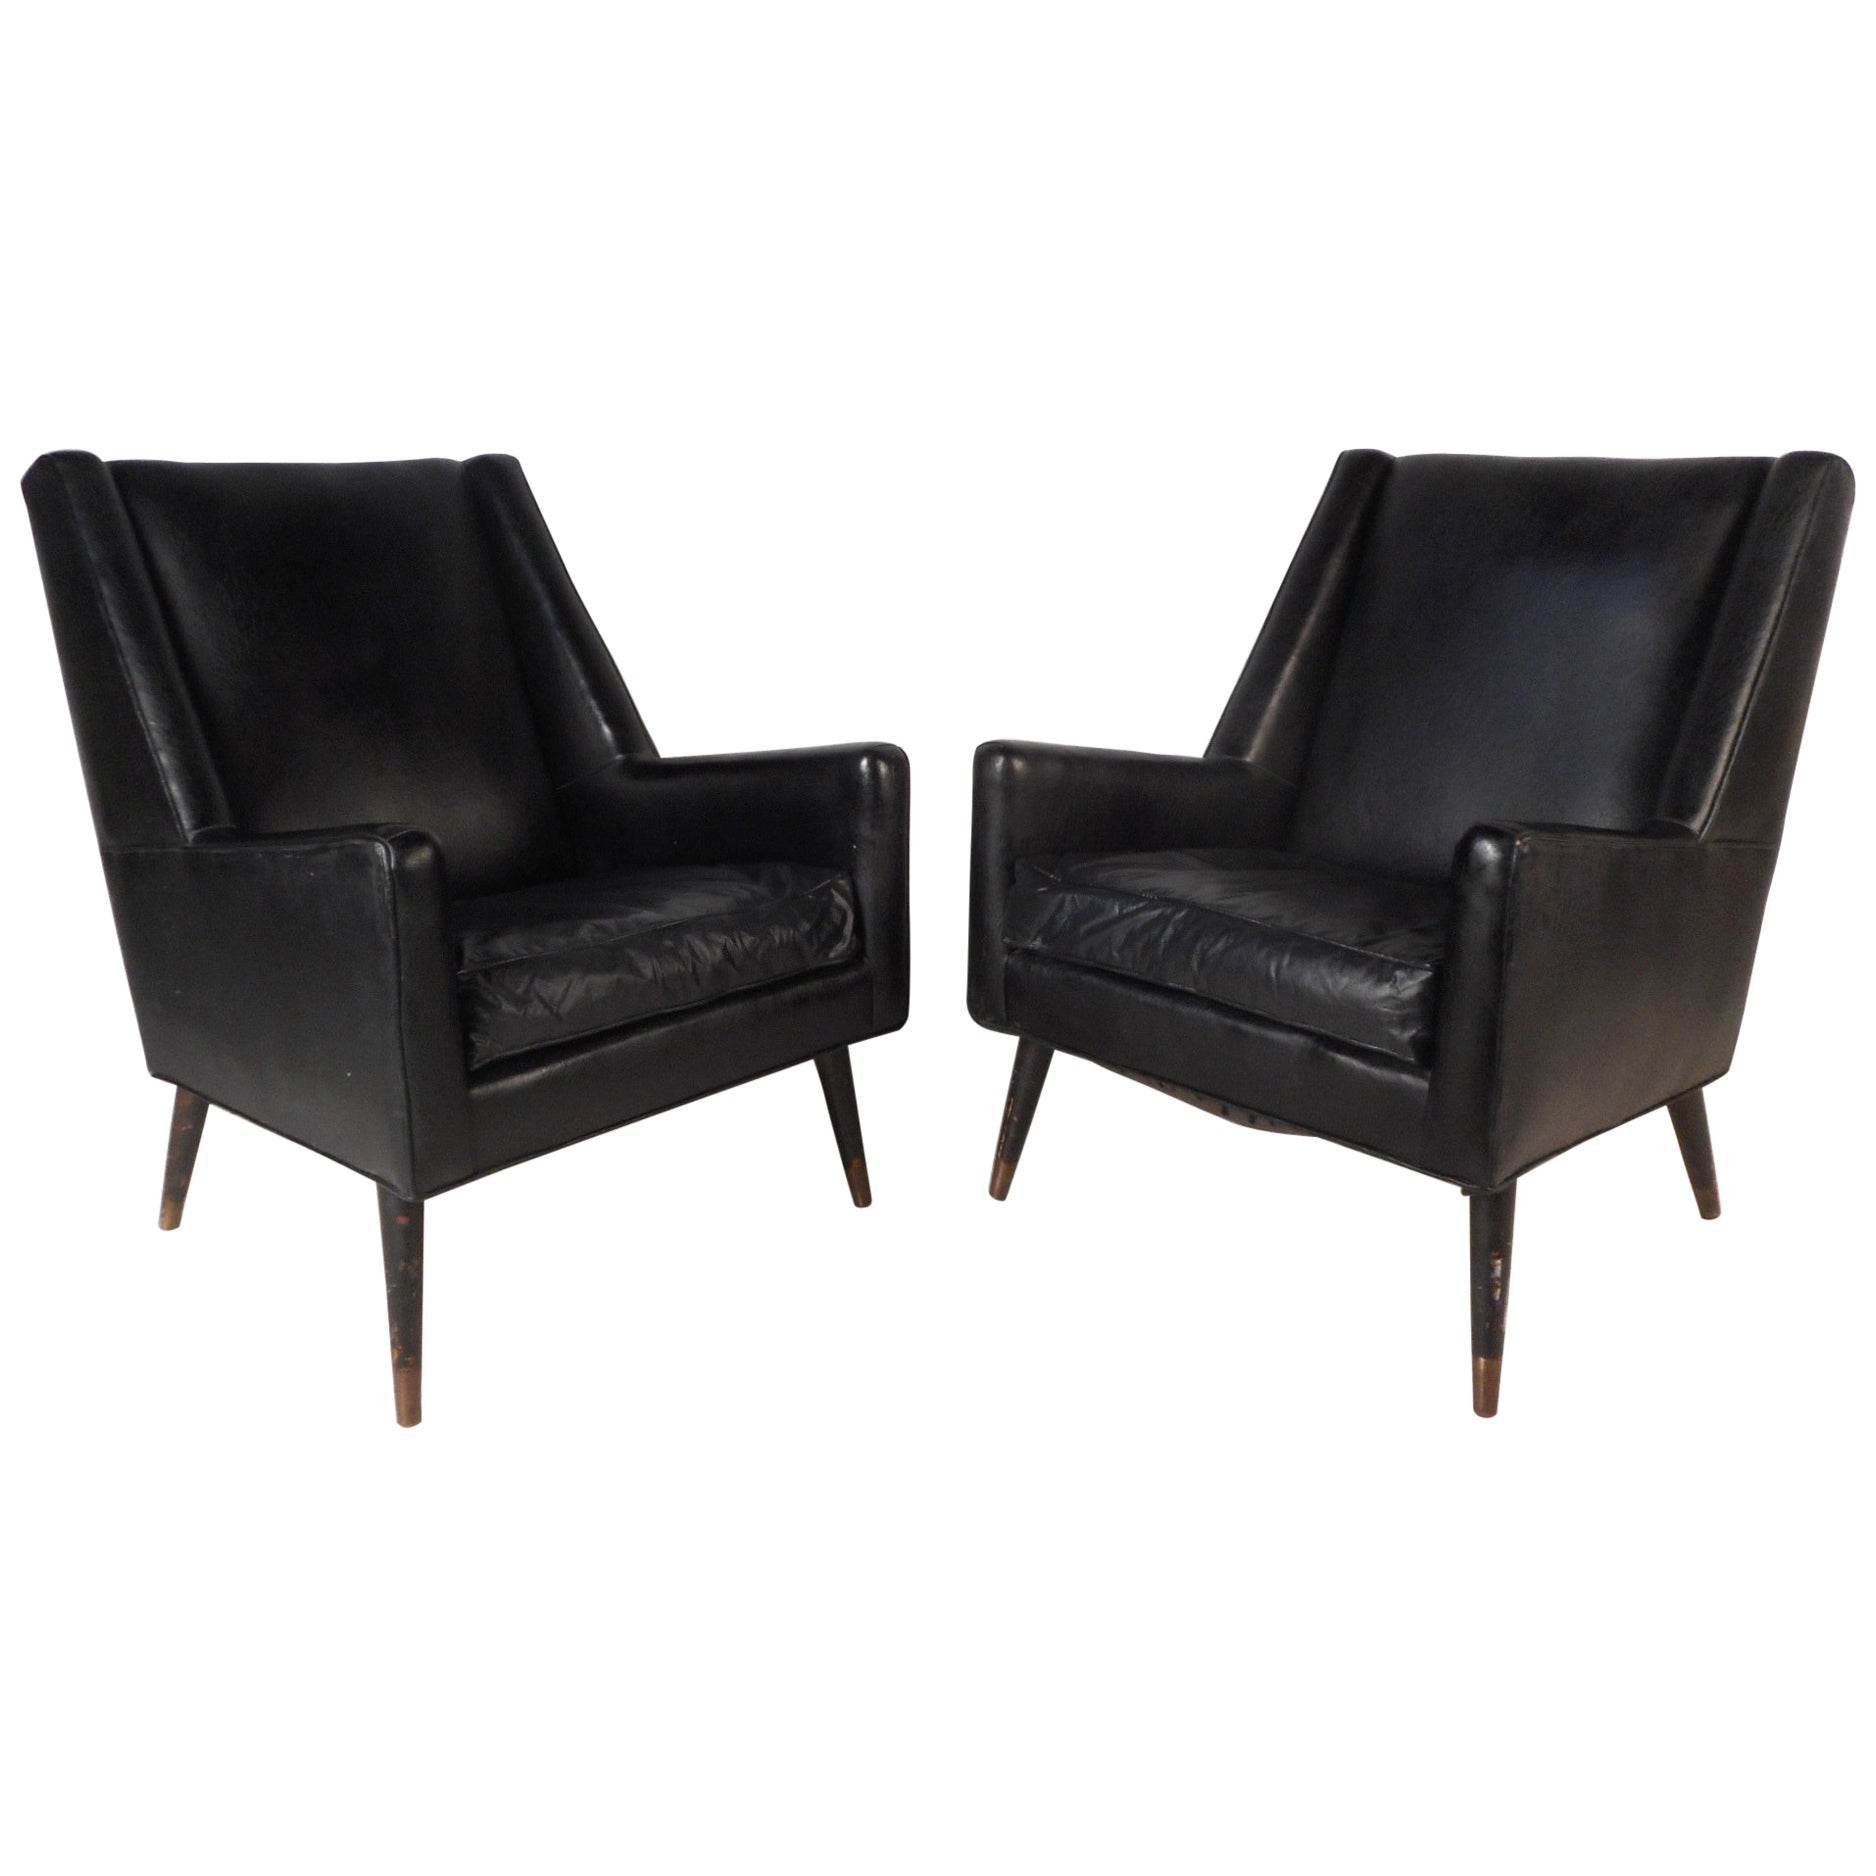 Pair of Midcentury Italian Lounge Chairs